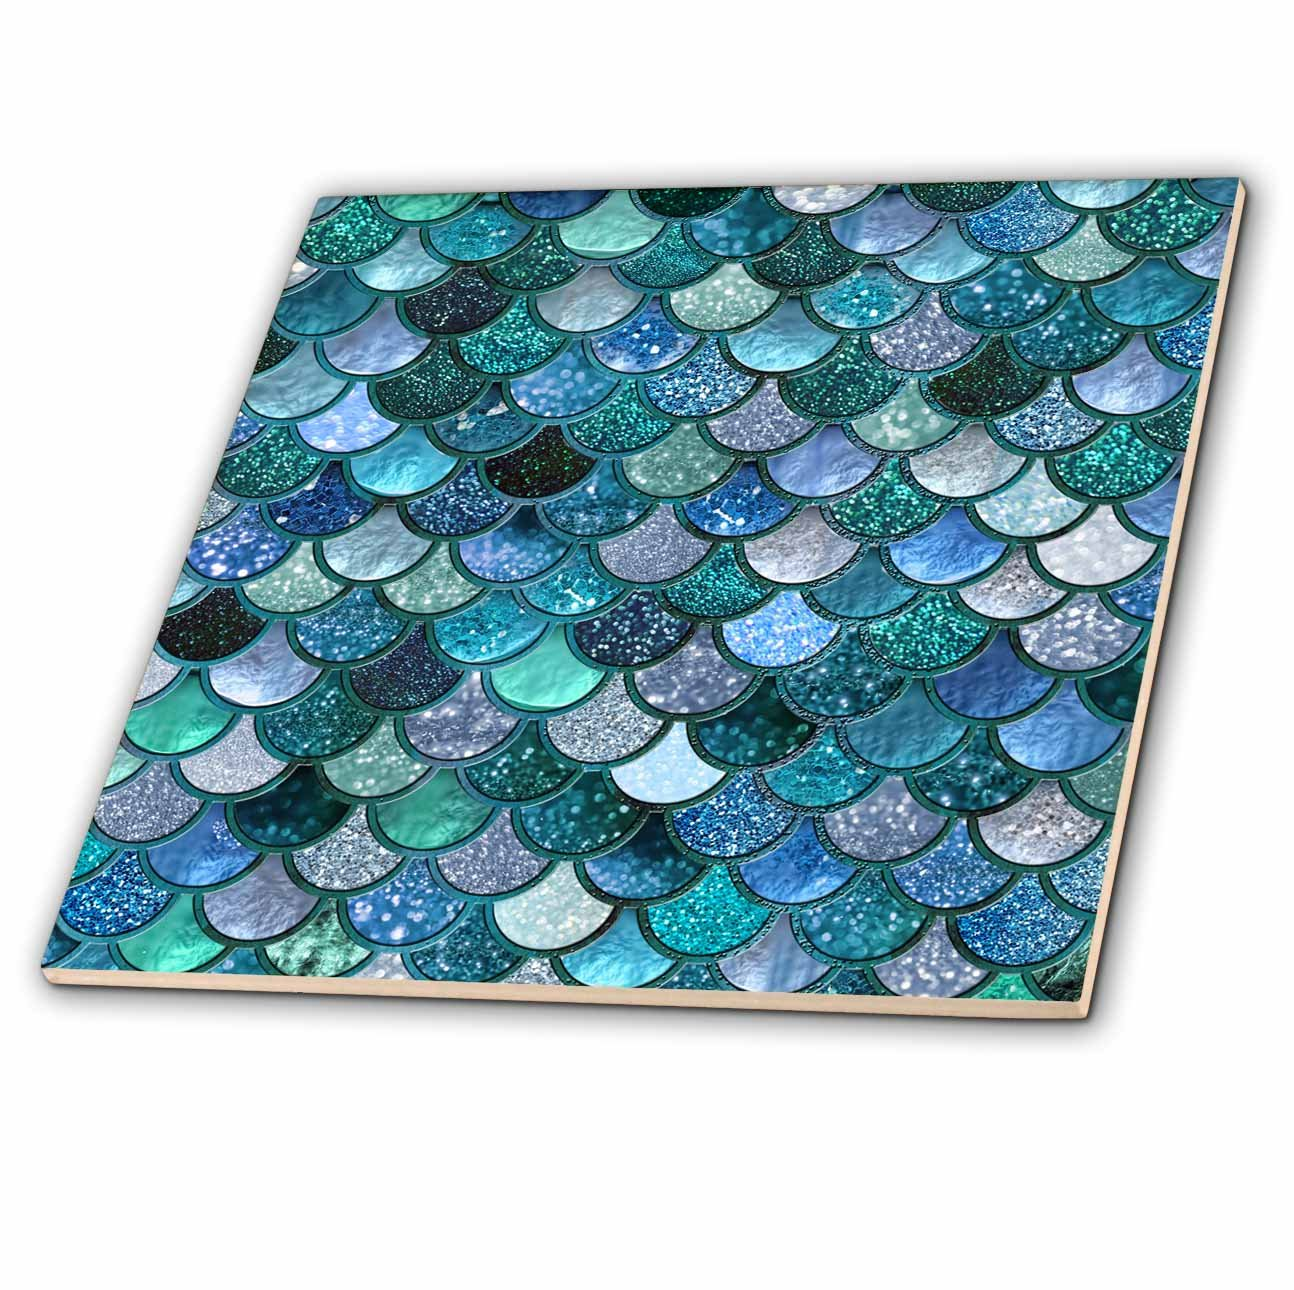 3dRose Uta Naumann Faux Glitter Pattern ct/_272861/_3 8 Inch Ceramic Tile Multicolor Girly Trend Blue Luxury Elegant Mermaid Scales Glitter